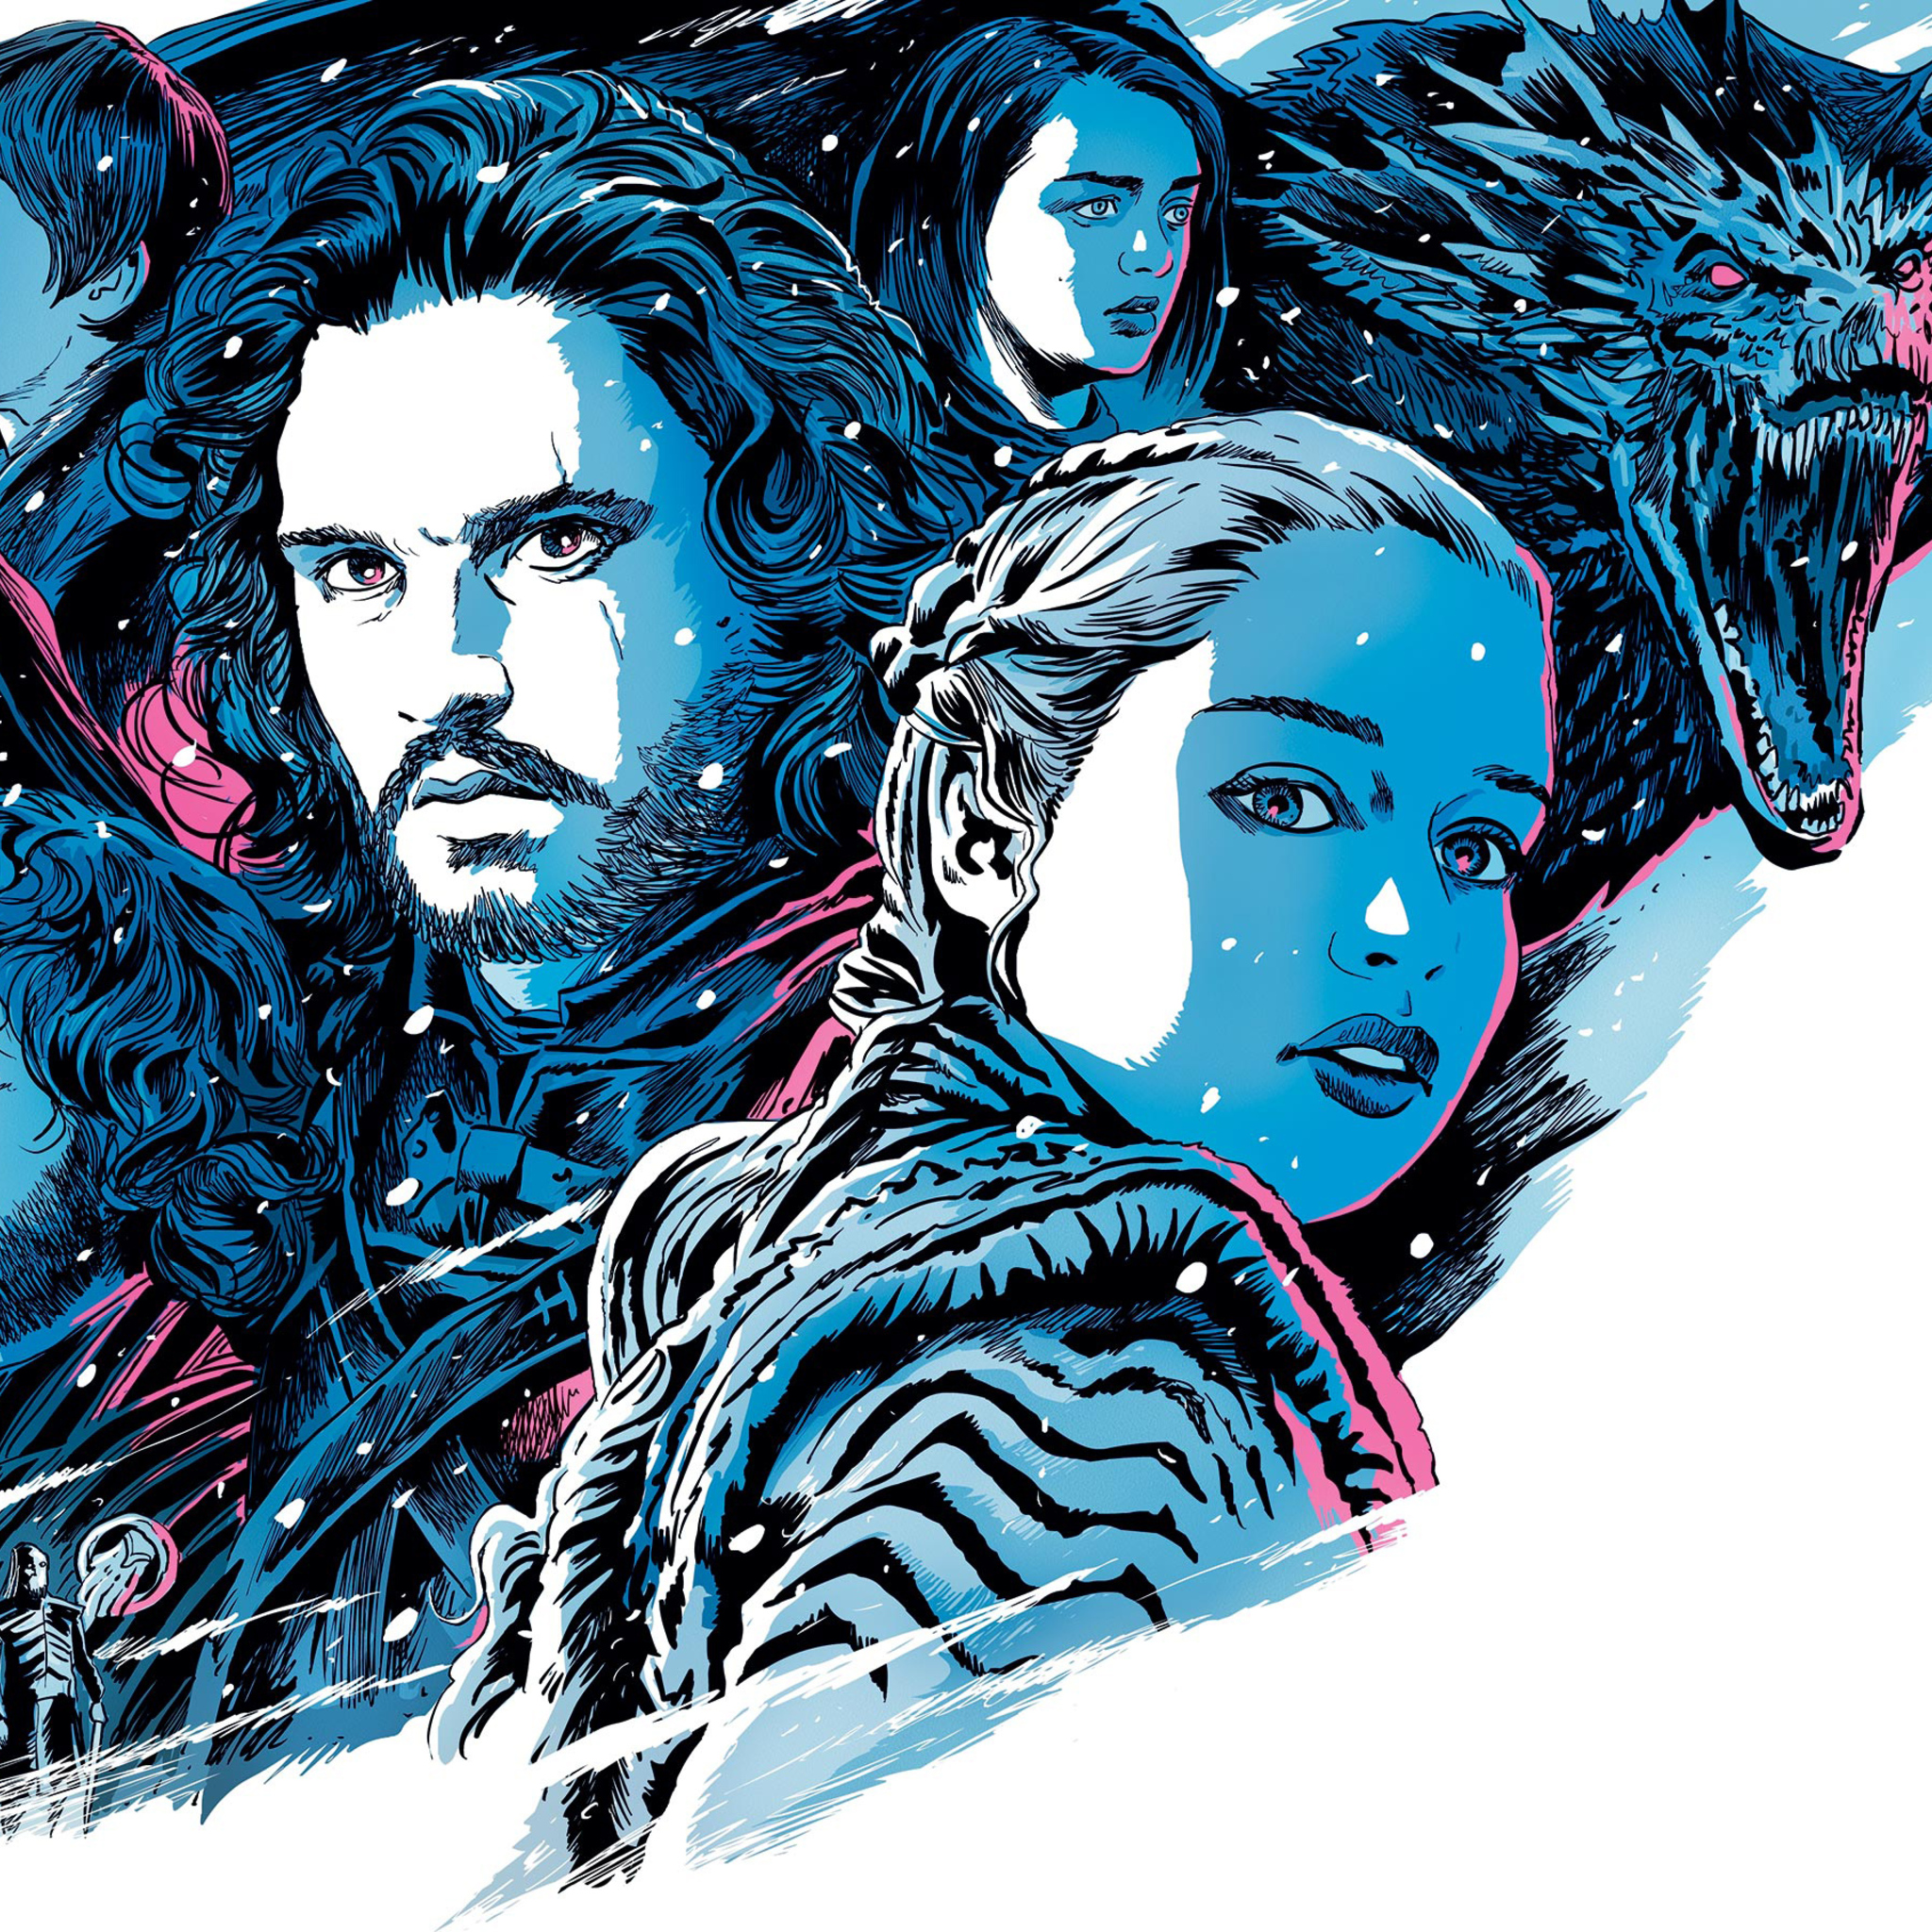 2048x2048 Game Of Thrones Season 8 Illustration Ipad Air